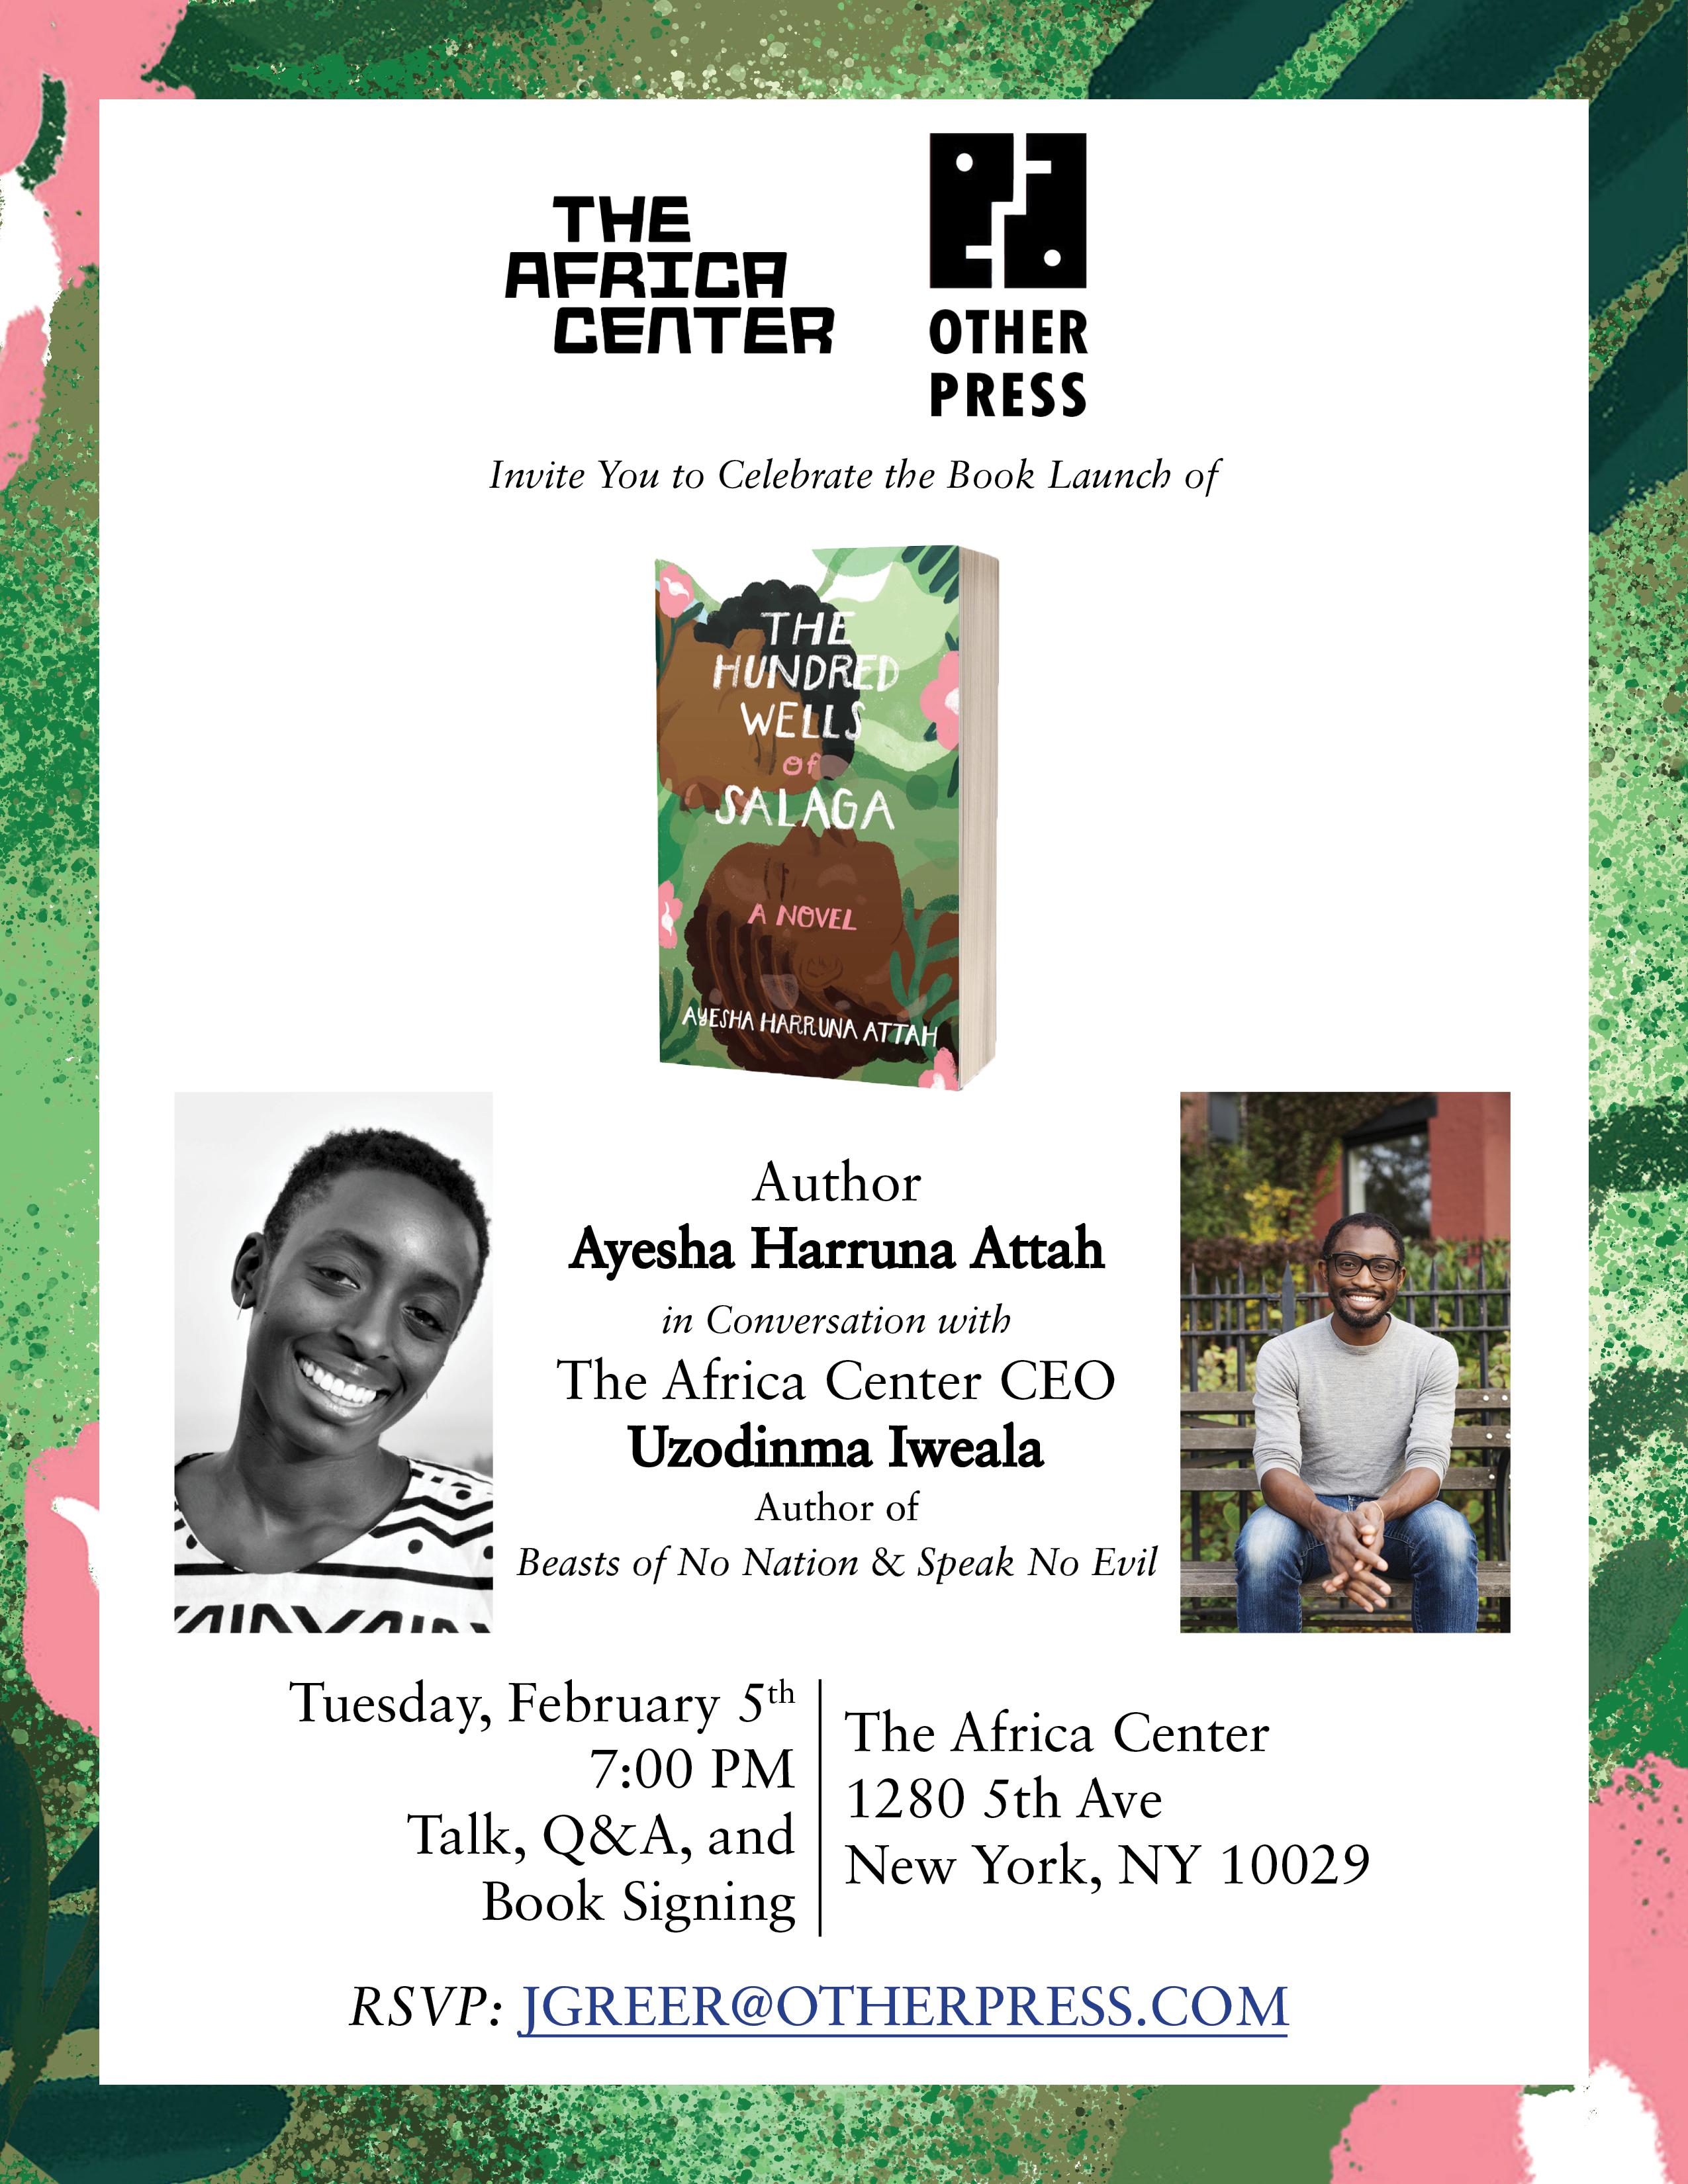 Flyer for Ayesha Harruna Attah Book Launch